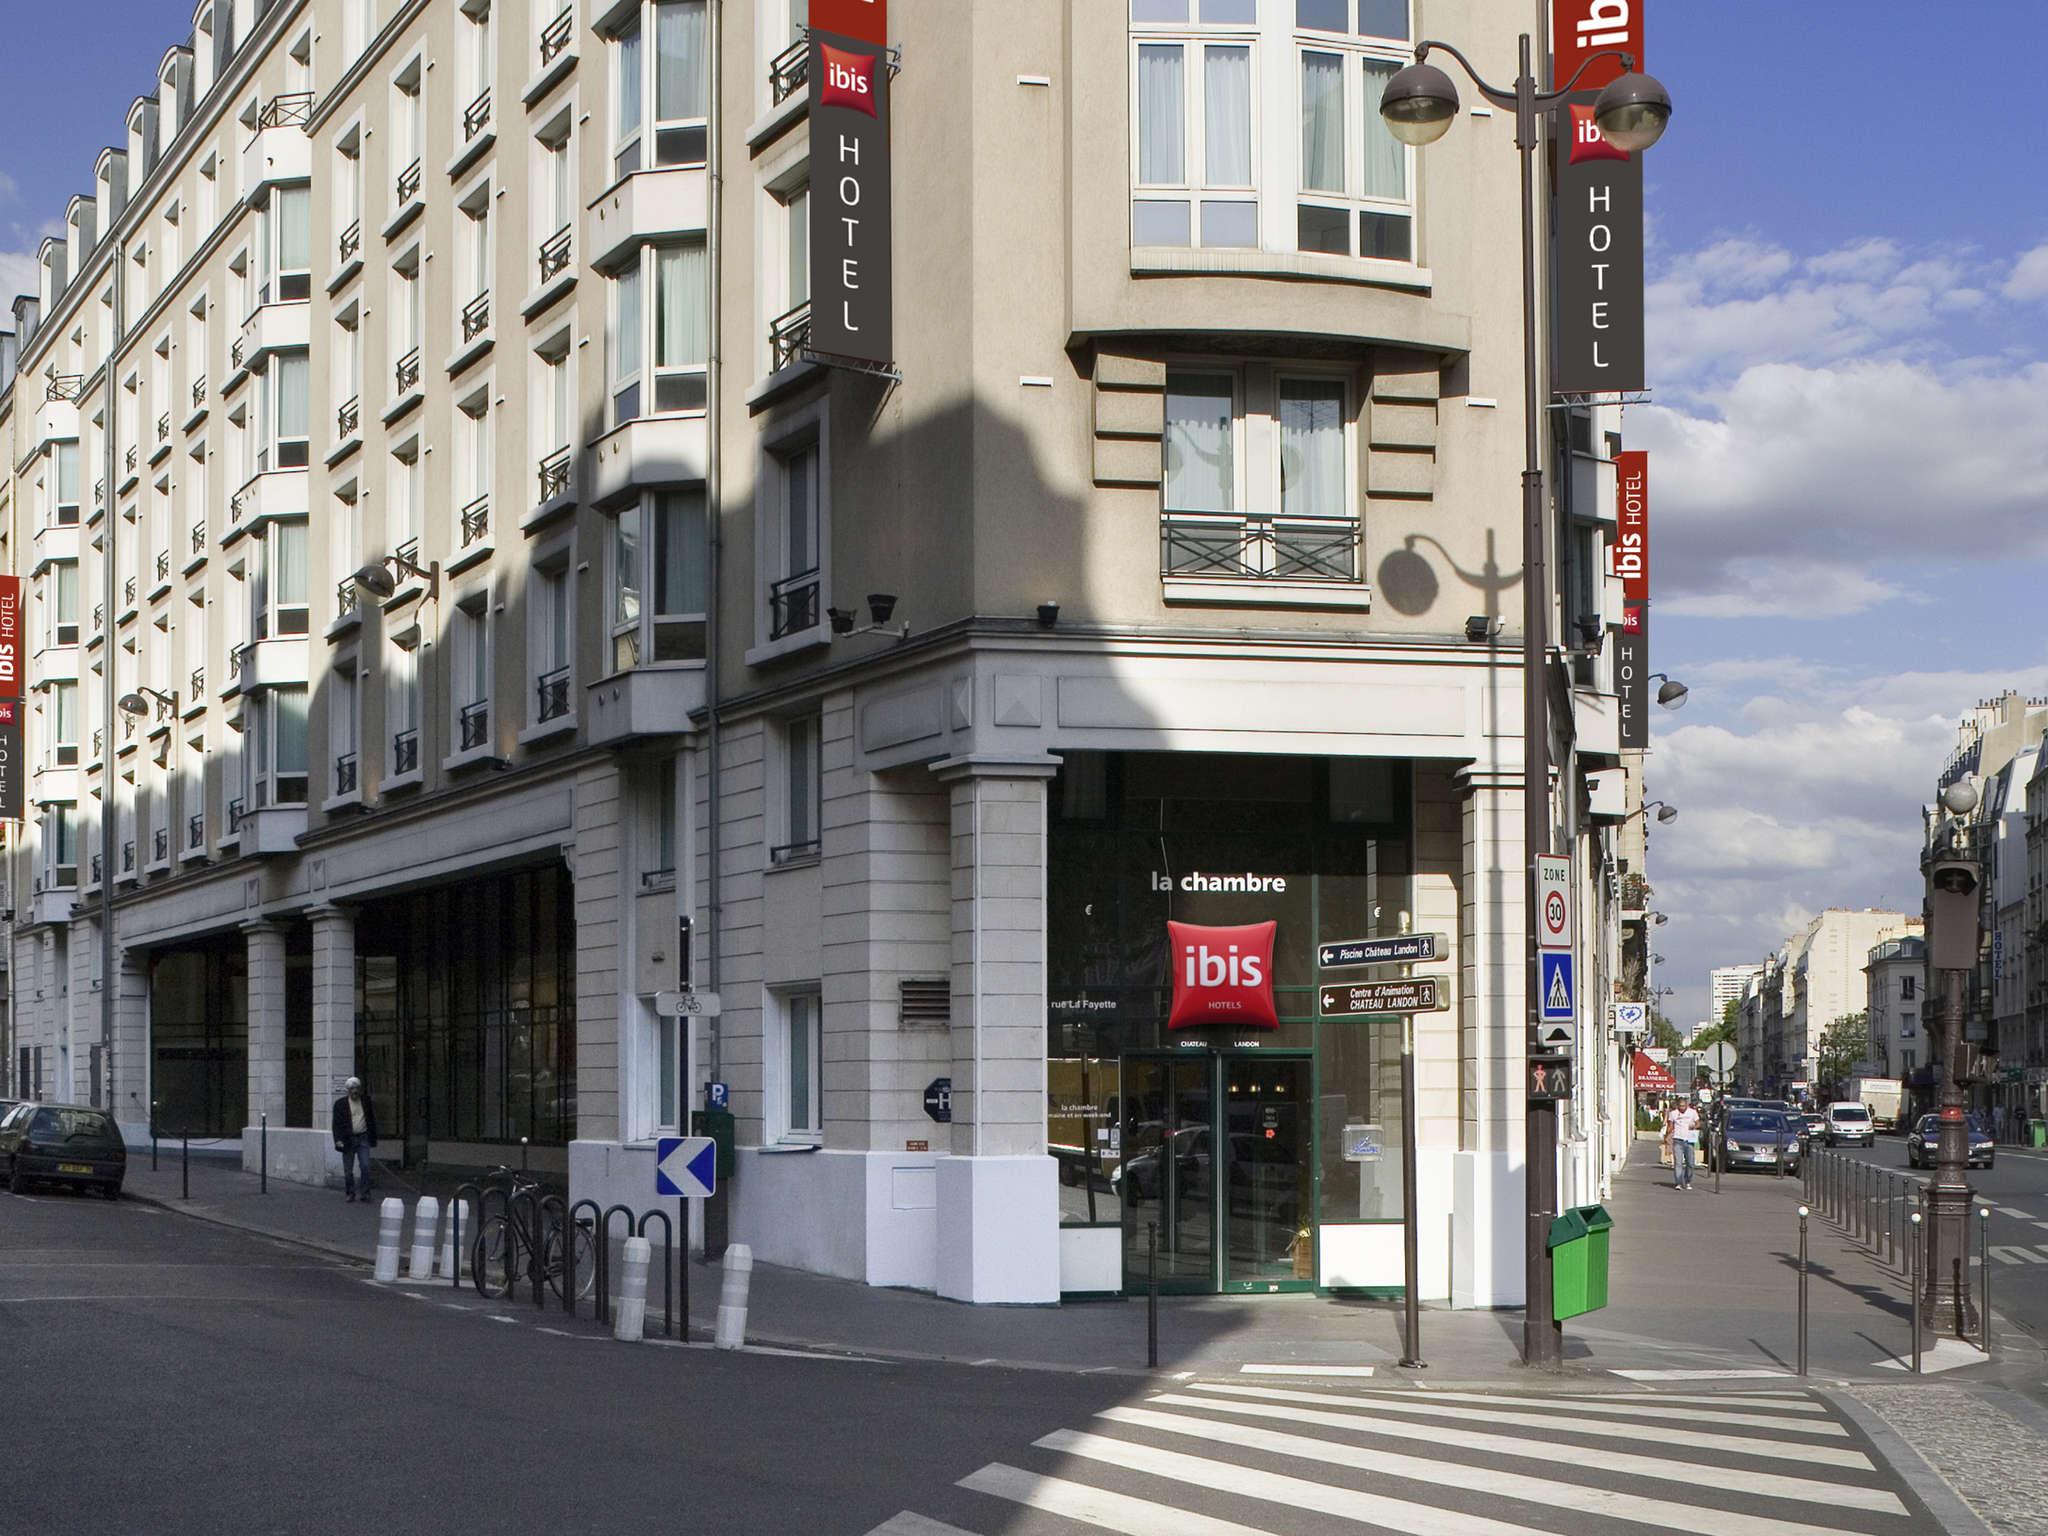 hotel in paris ibis paris gare du nord chateau landon 10th. Black Bedroom Furniture Sets. Home Design Ideas